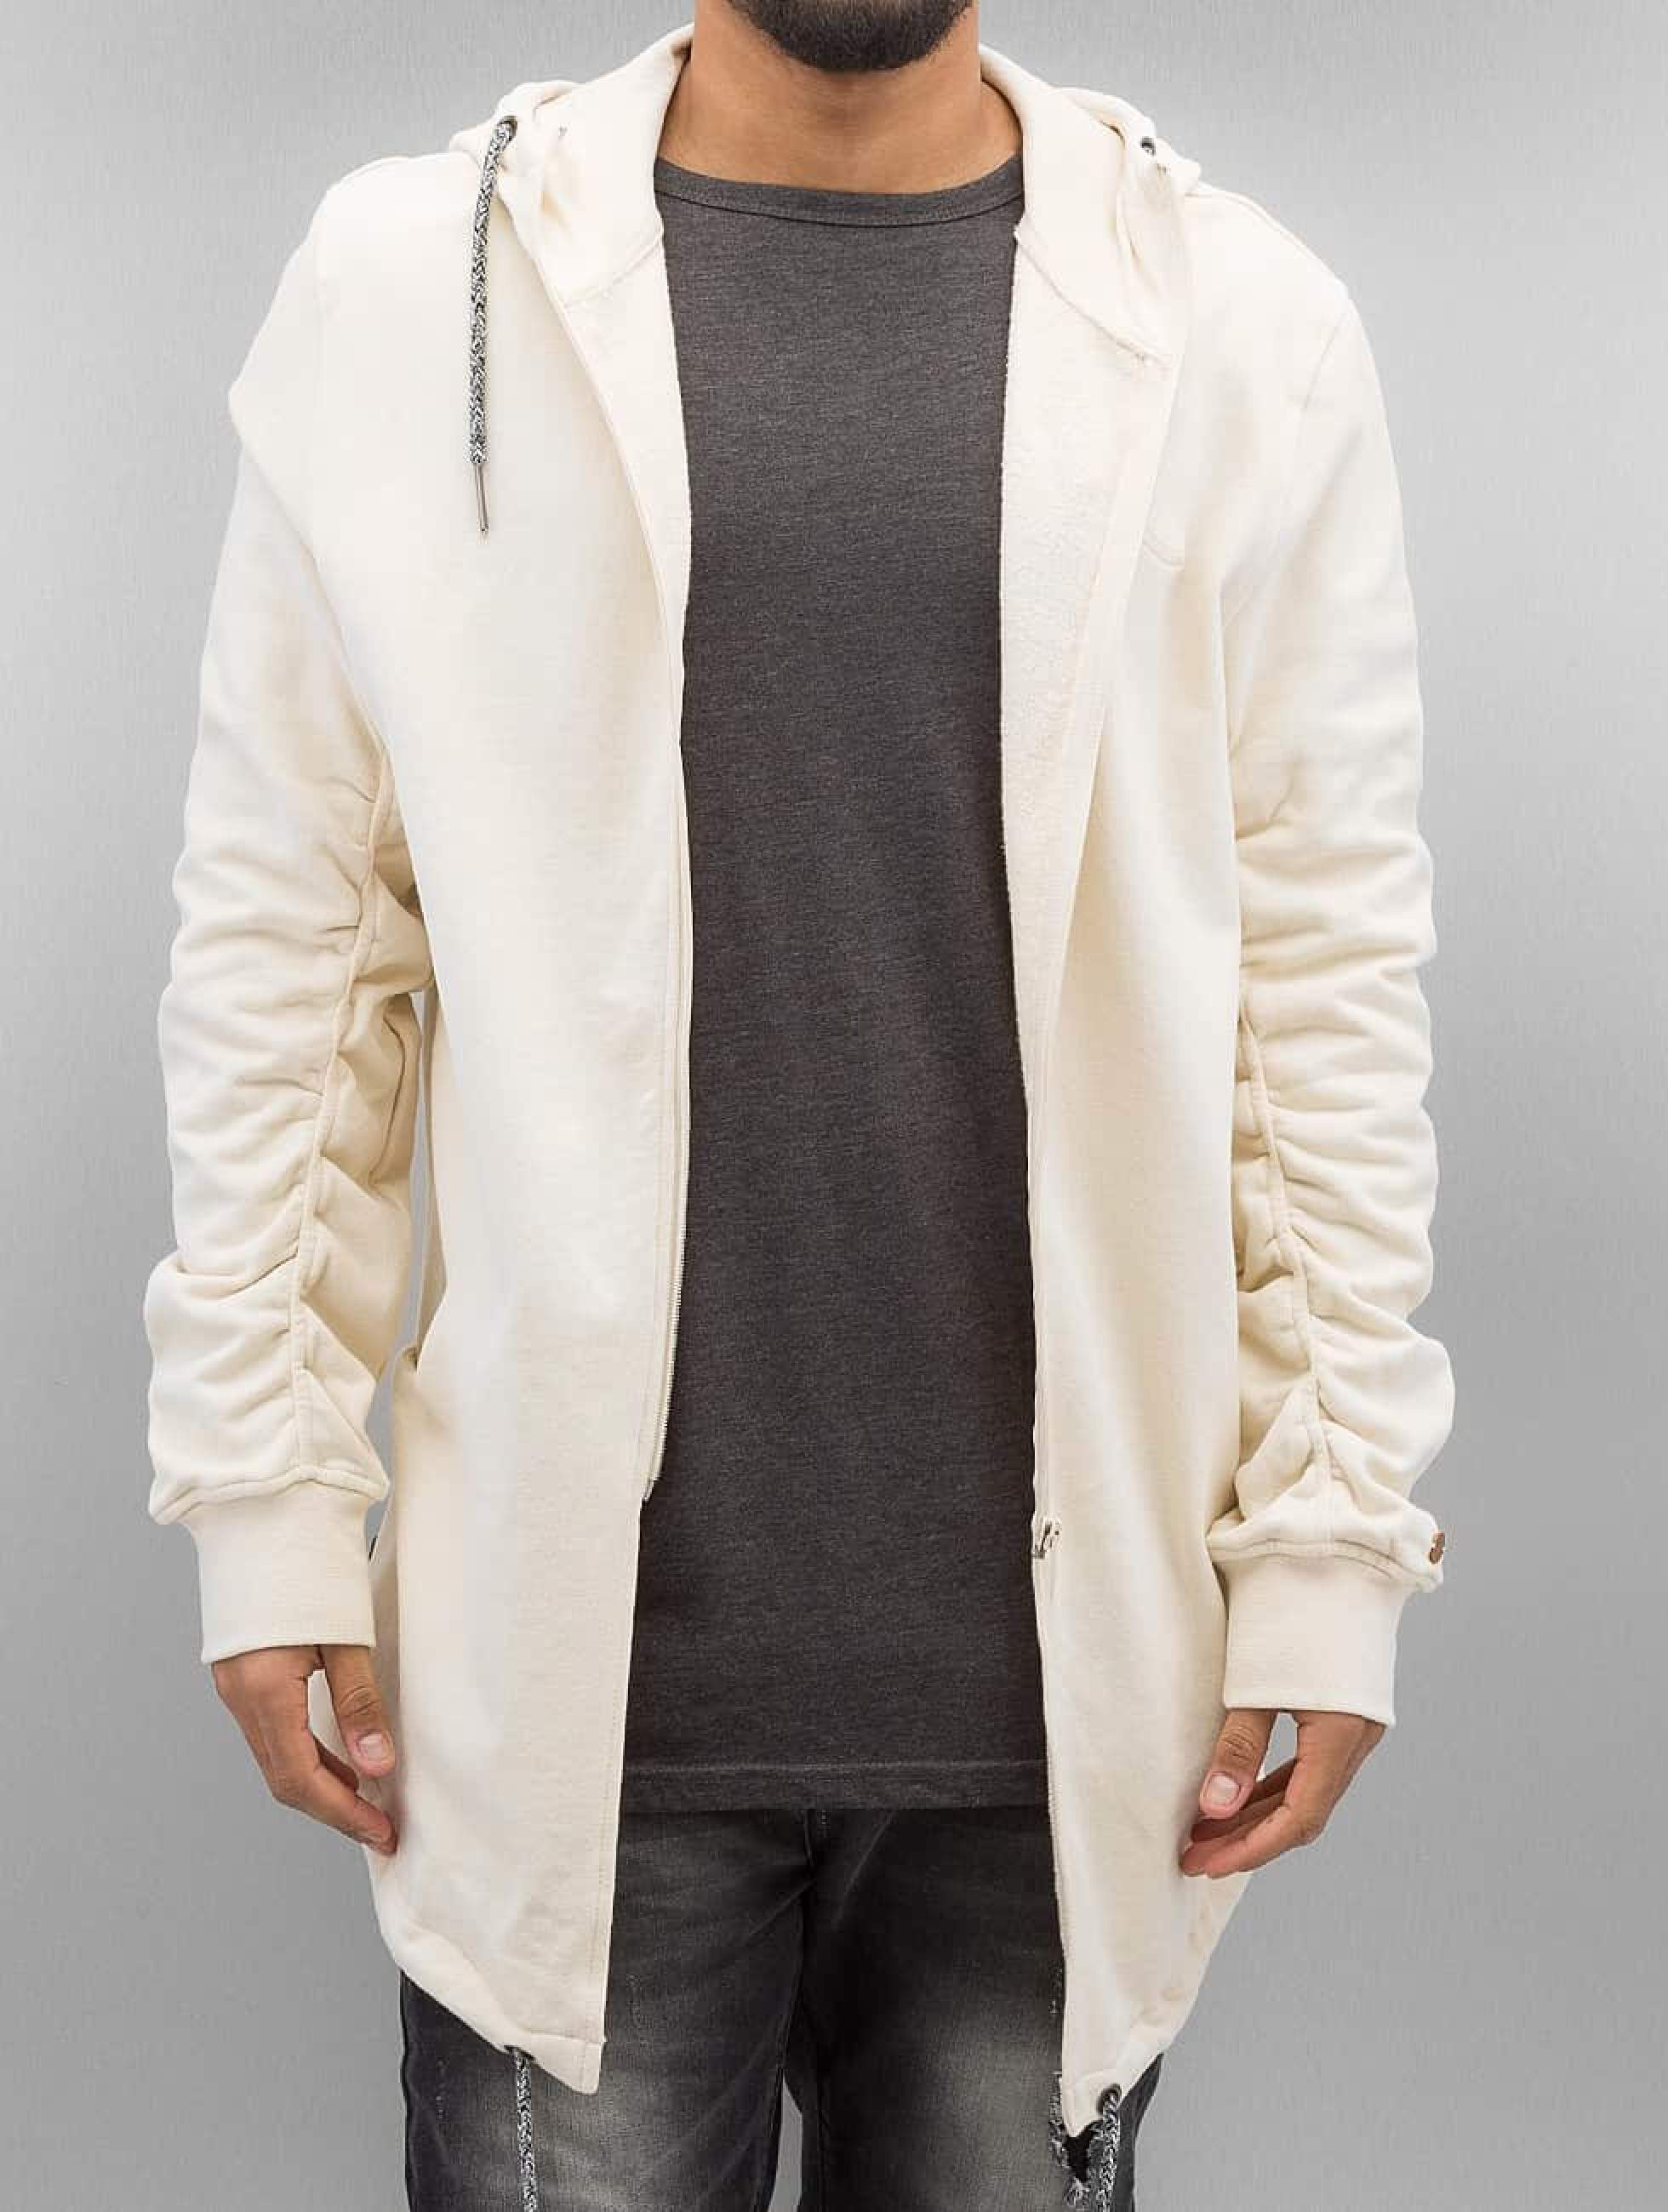 Rocawear / Zip Hoodie Zip Hoody in beige XL